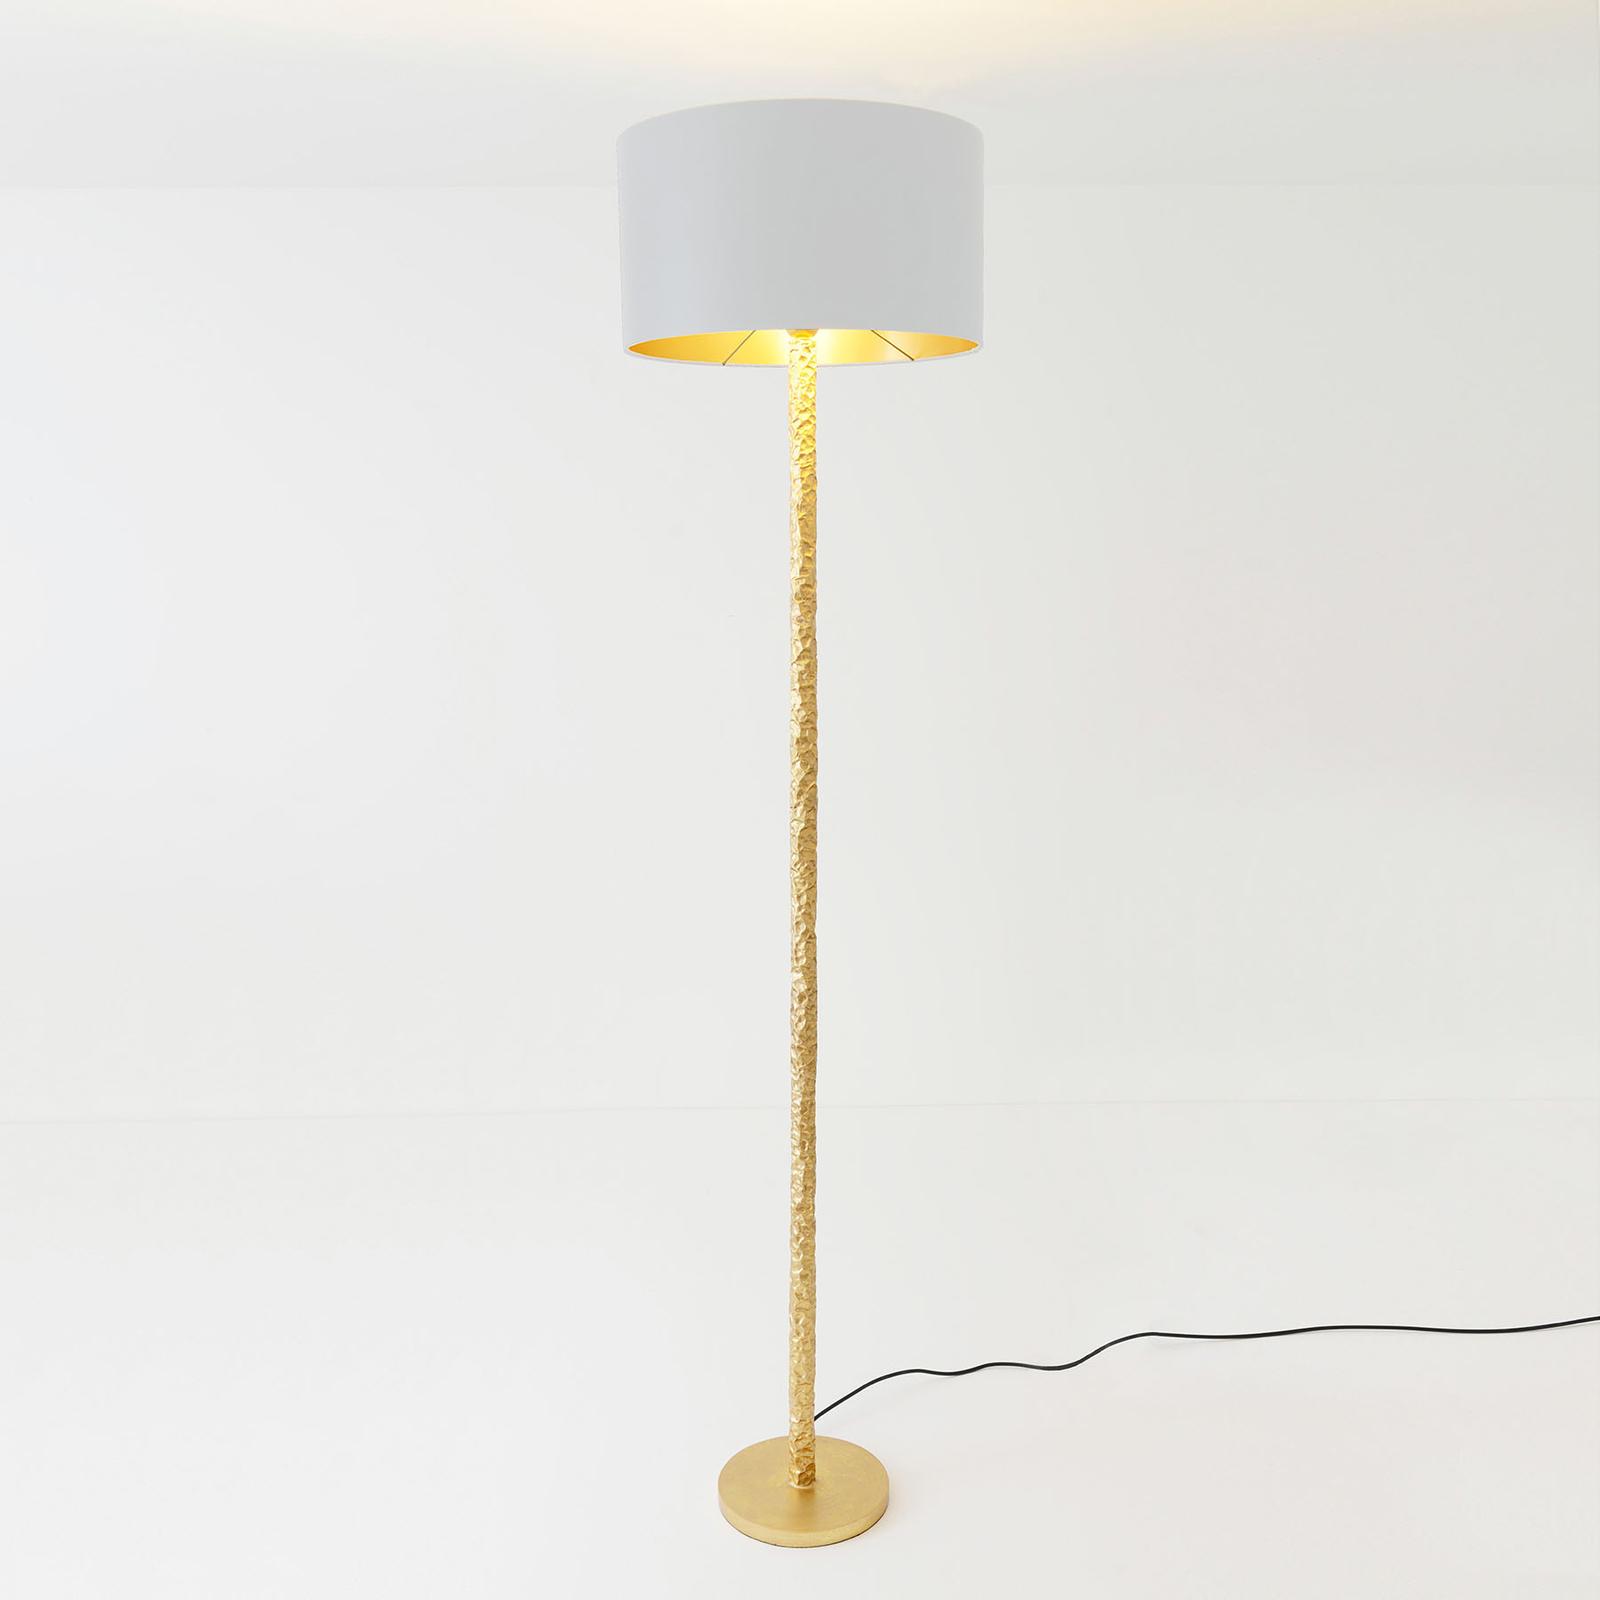 Vloerlamp Cancelliere Rotonda zijde wit/goud